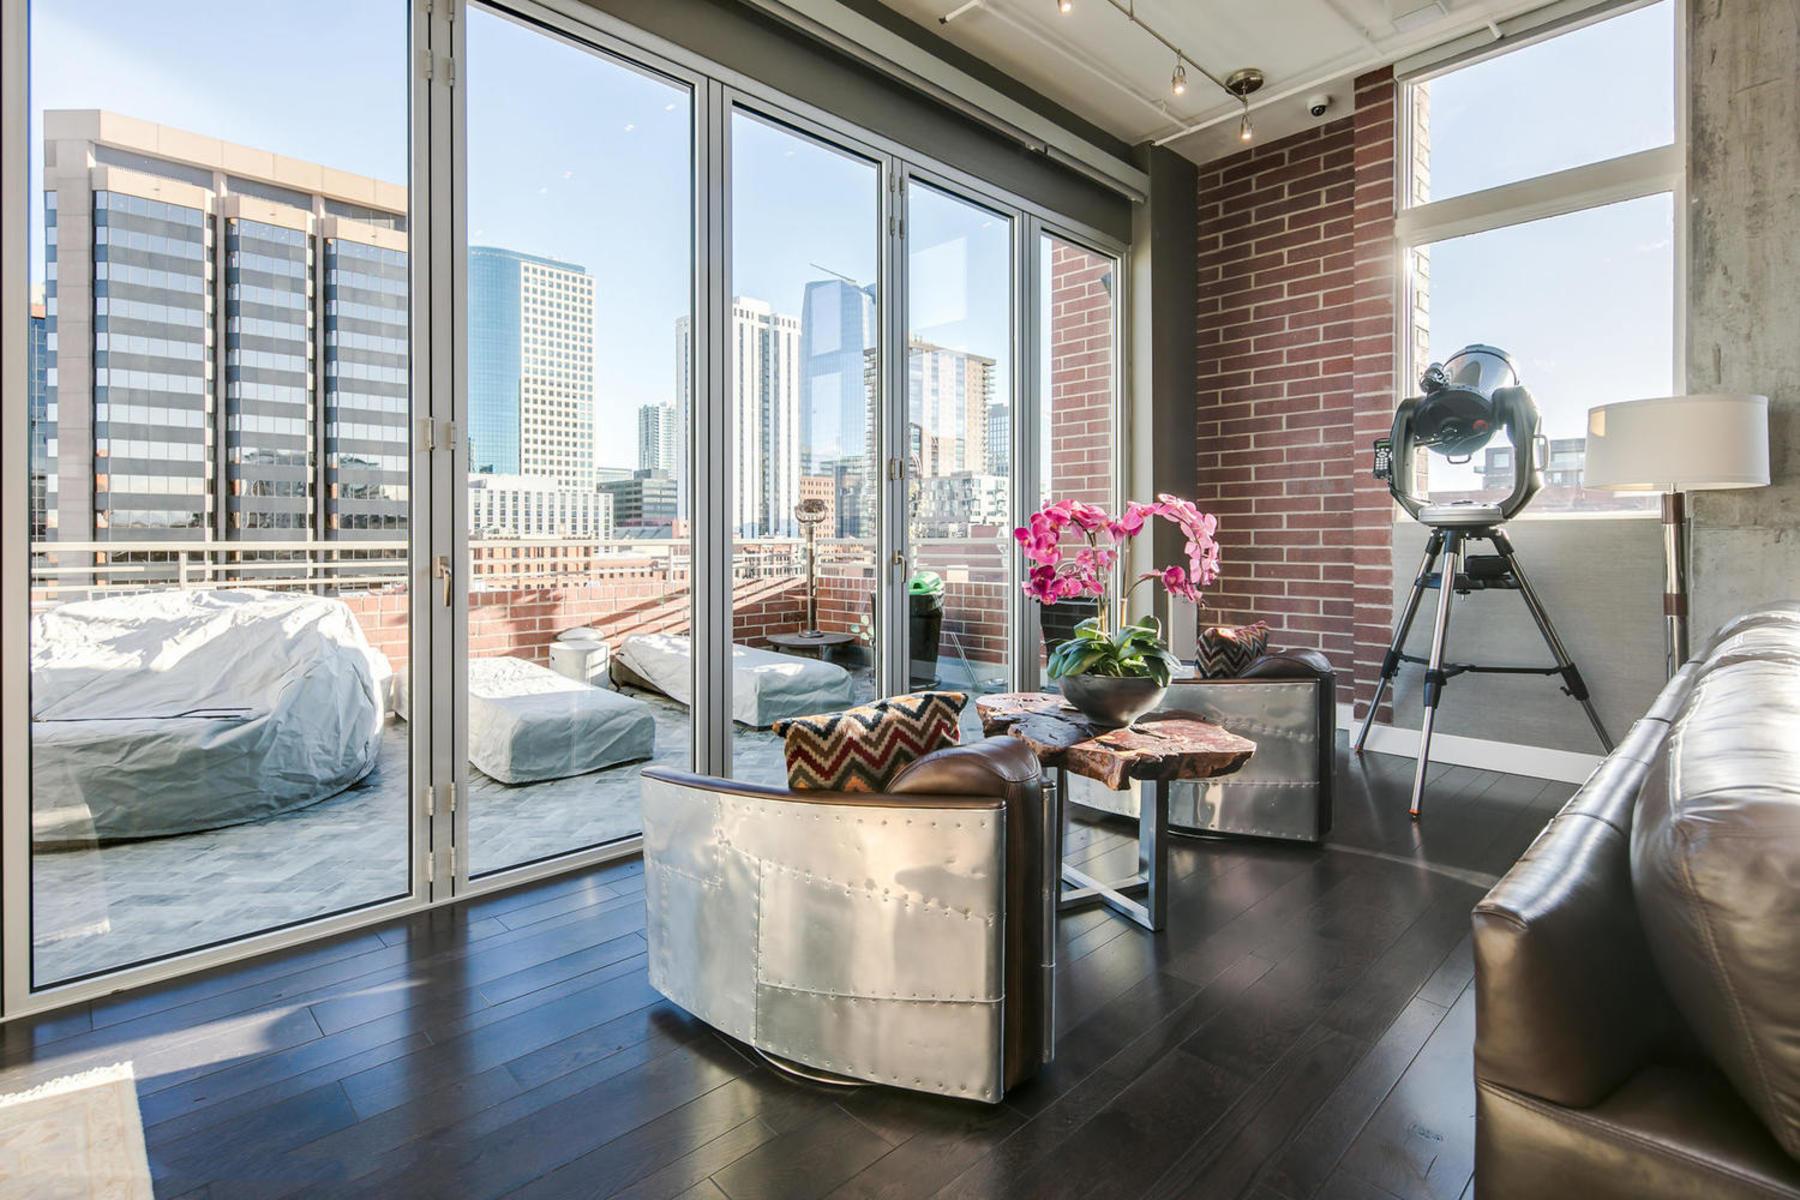 Additional photo for property listing at Corner Unit Penthouse With Abundant Natural Light 1720 Wazee Street #6B Denver, Colorado 80202 United States